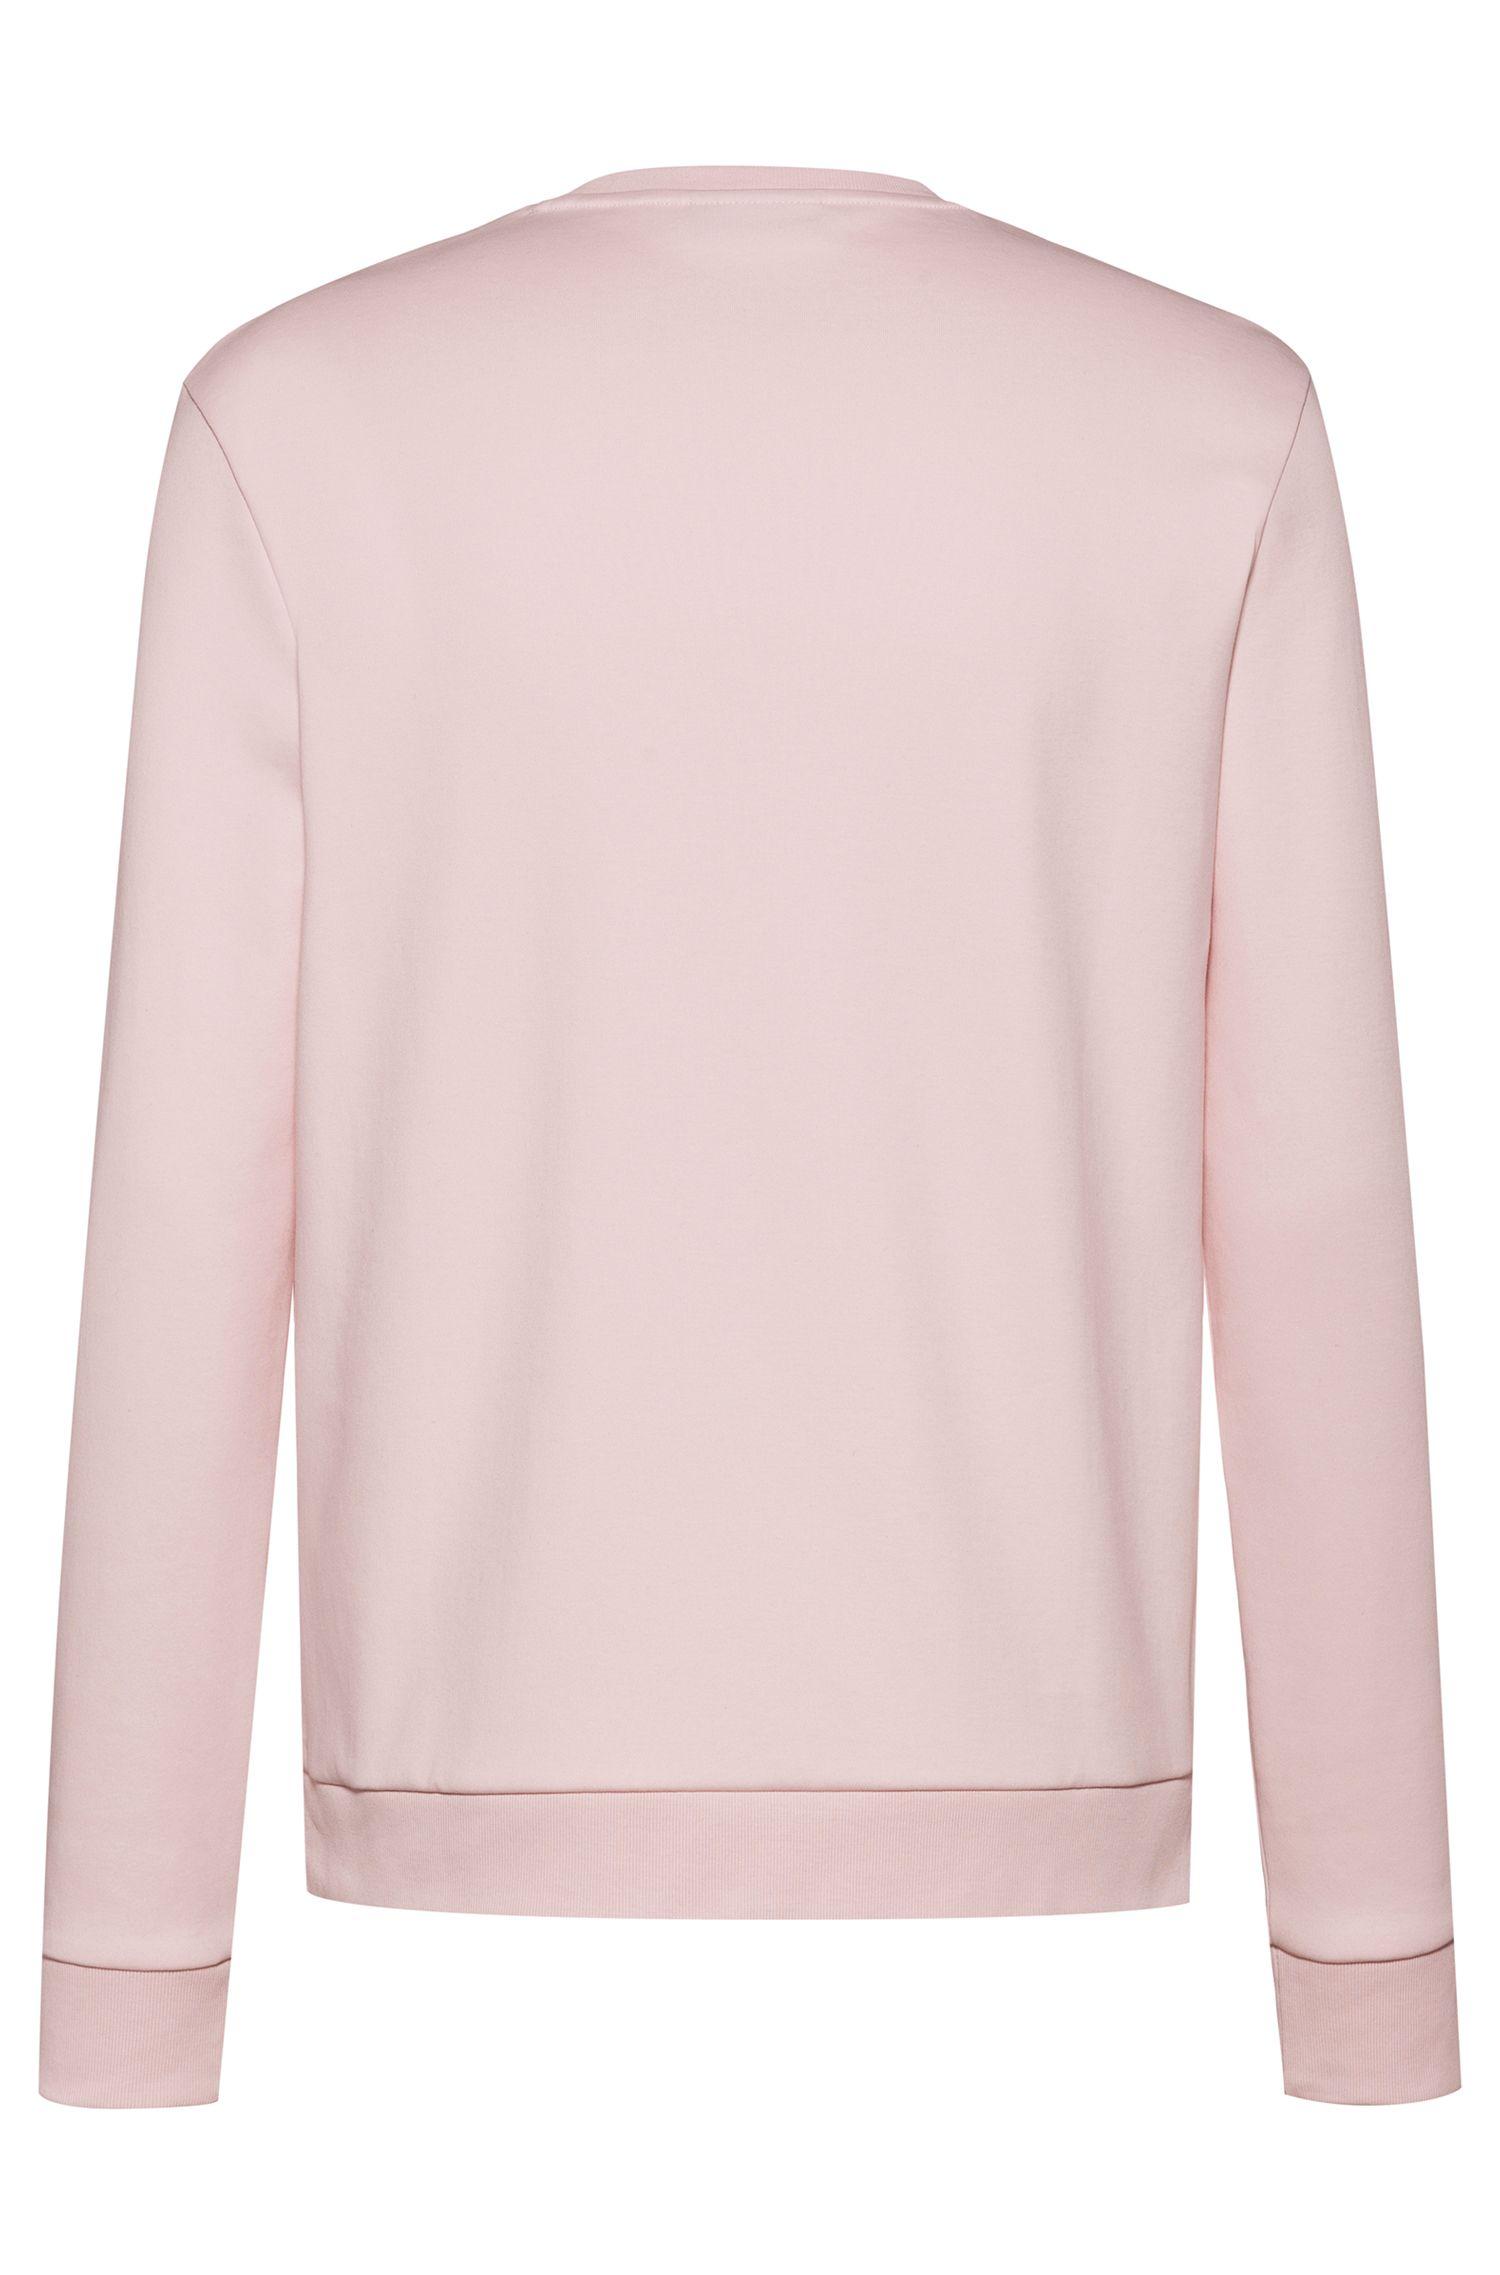 Reverse-logo sweatshirt in interlock cotton, light pink